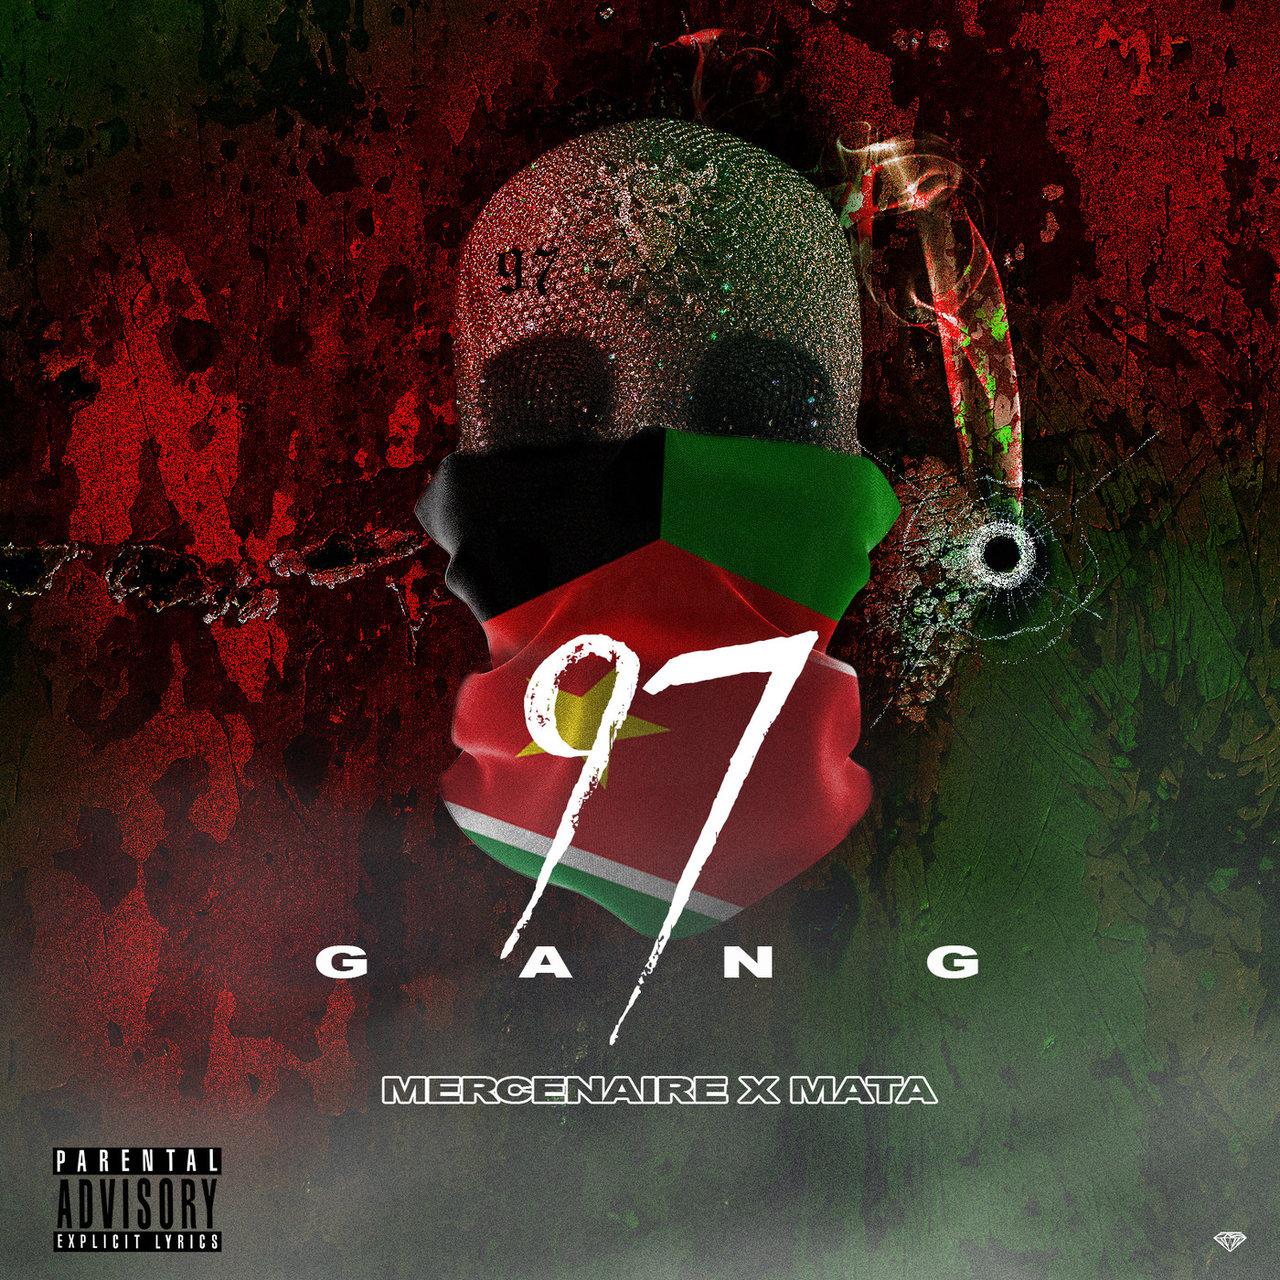 Mercenaire - 97Gang (ft. Mata) (Cover)